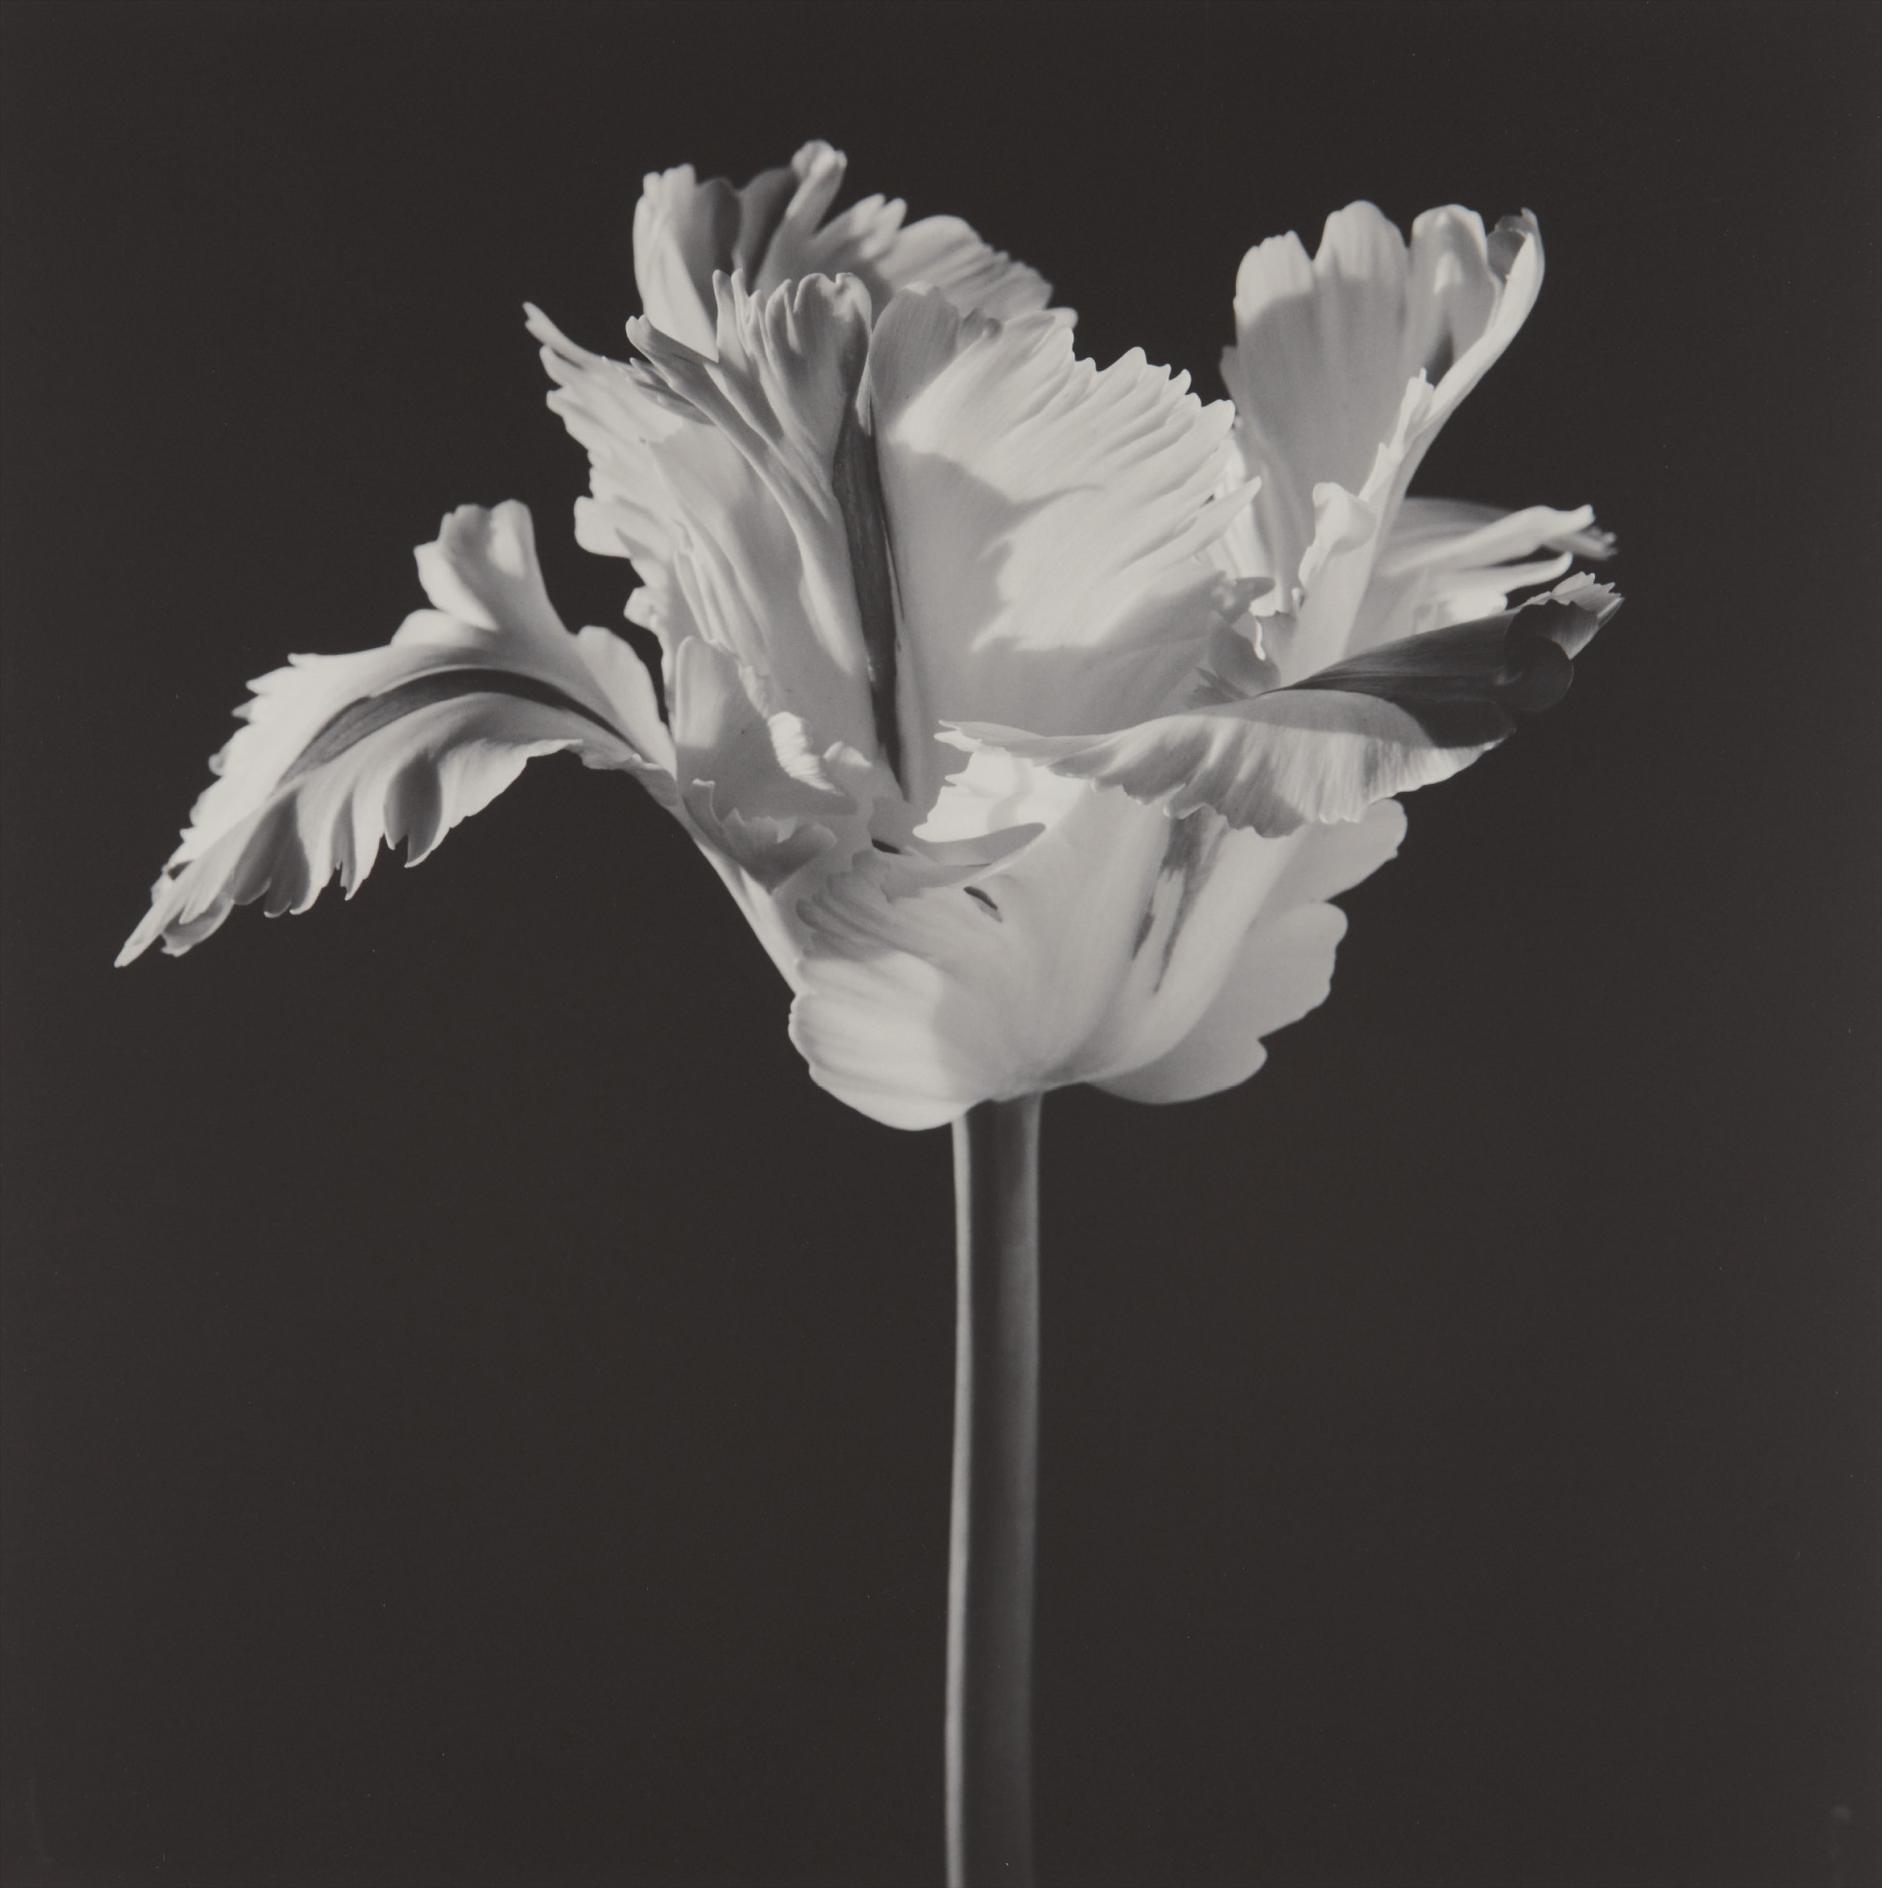 Robert Mapplethorpe-Parrot Tulip-1988